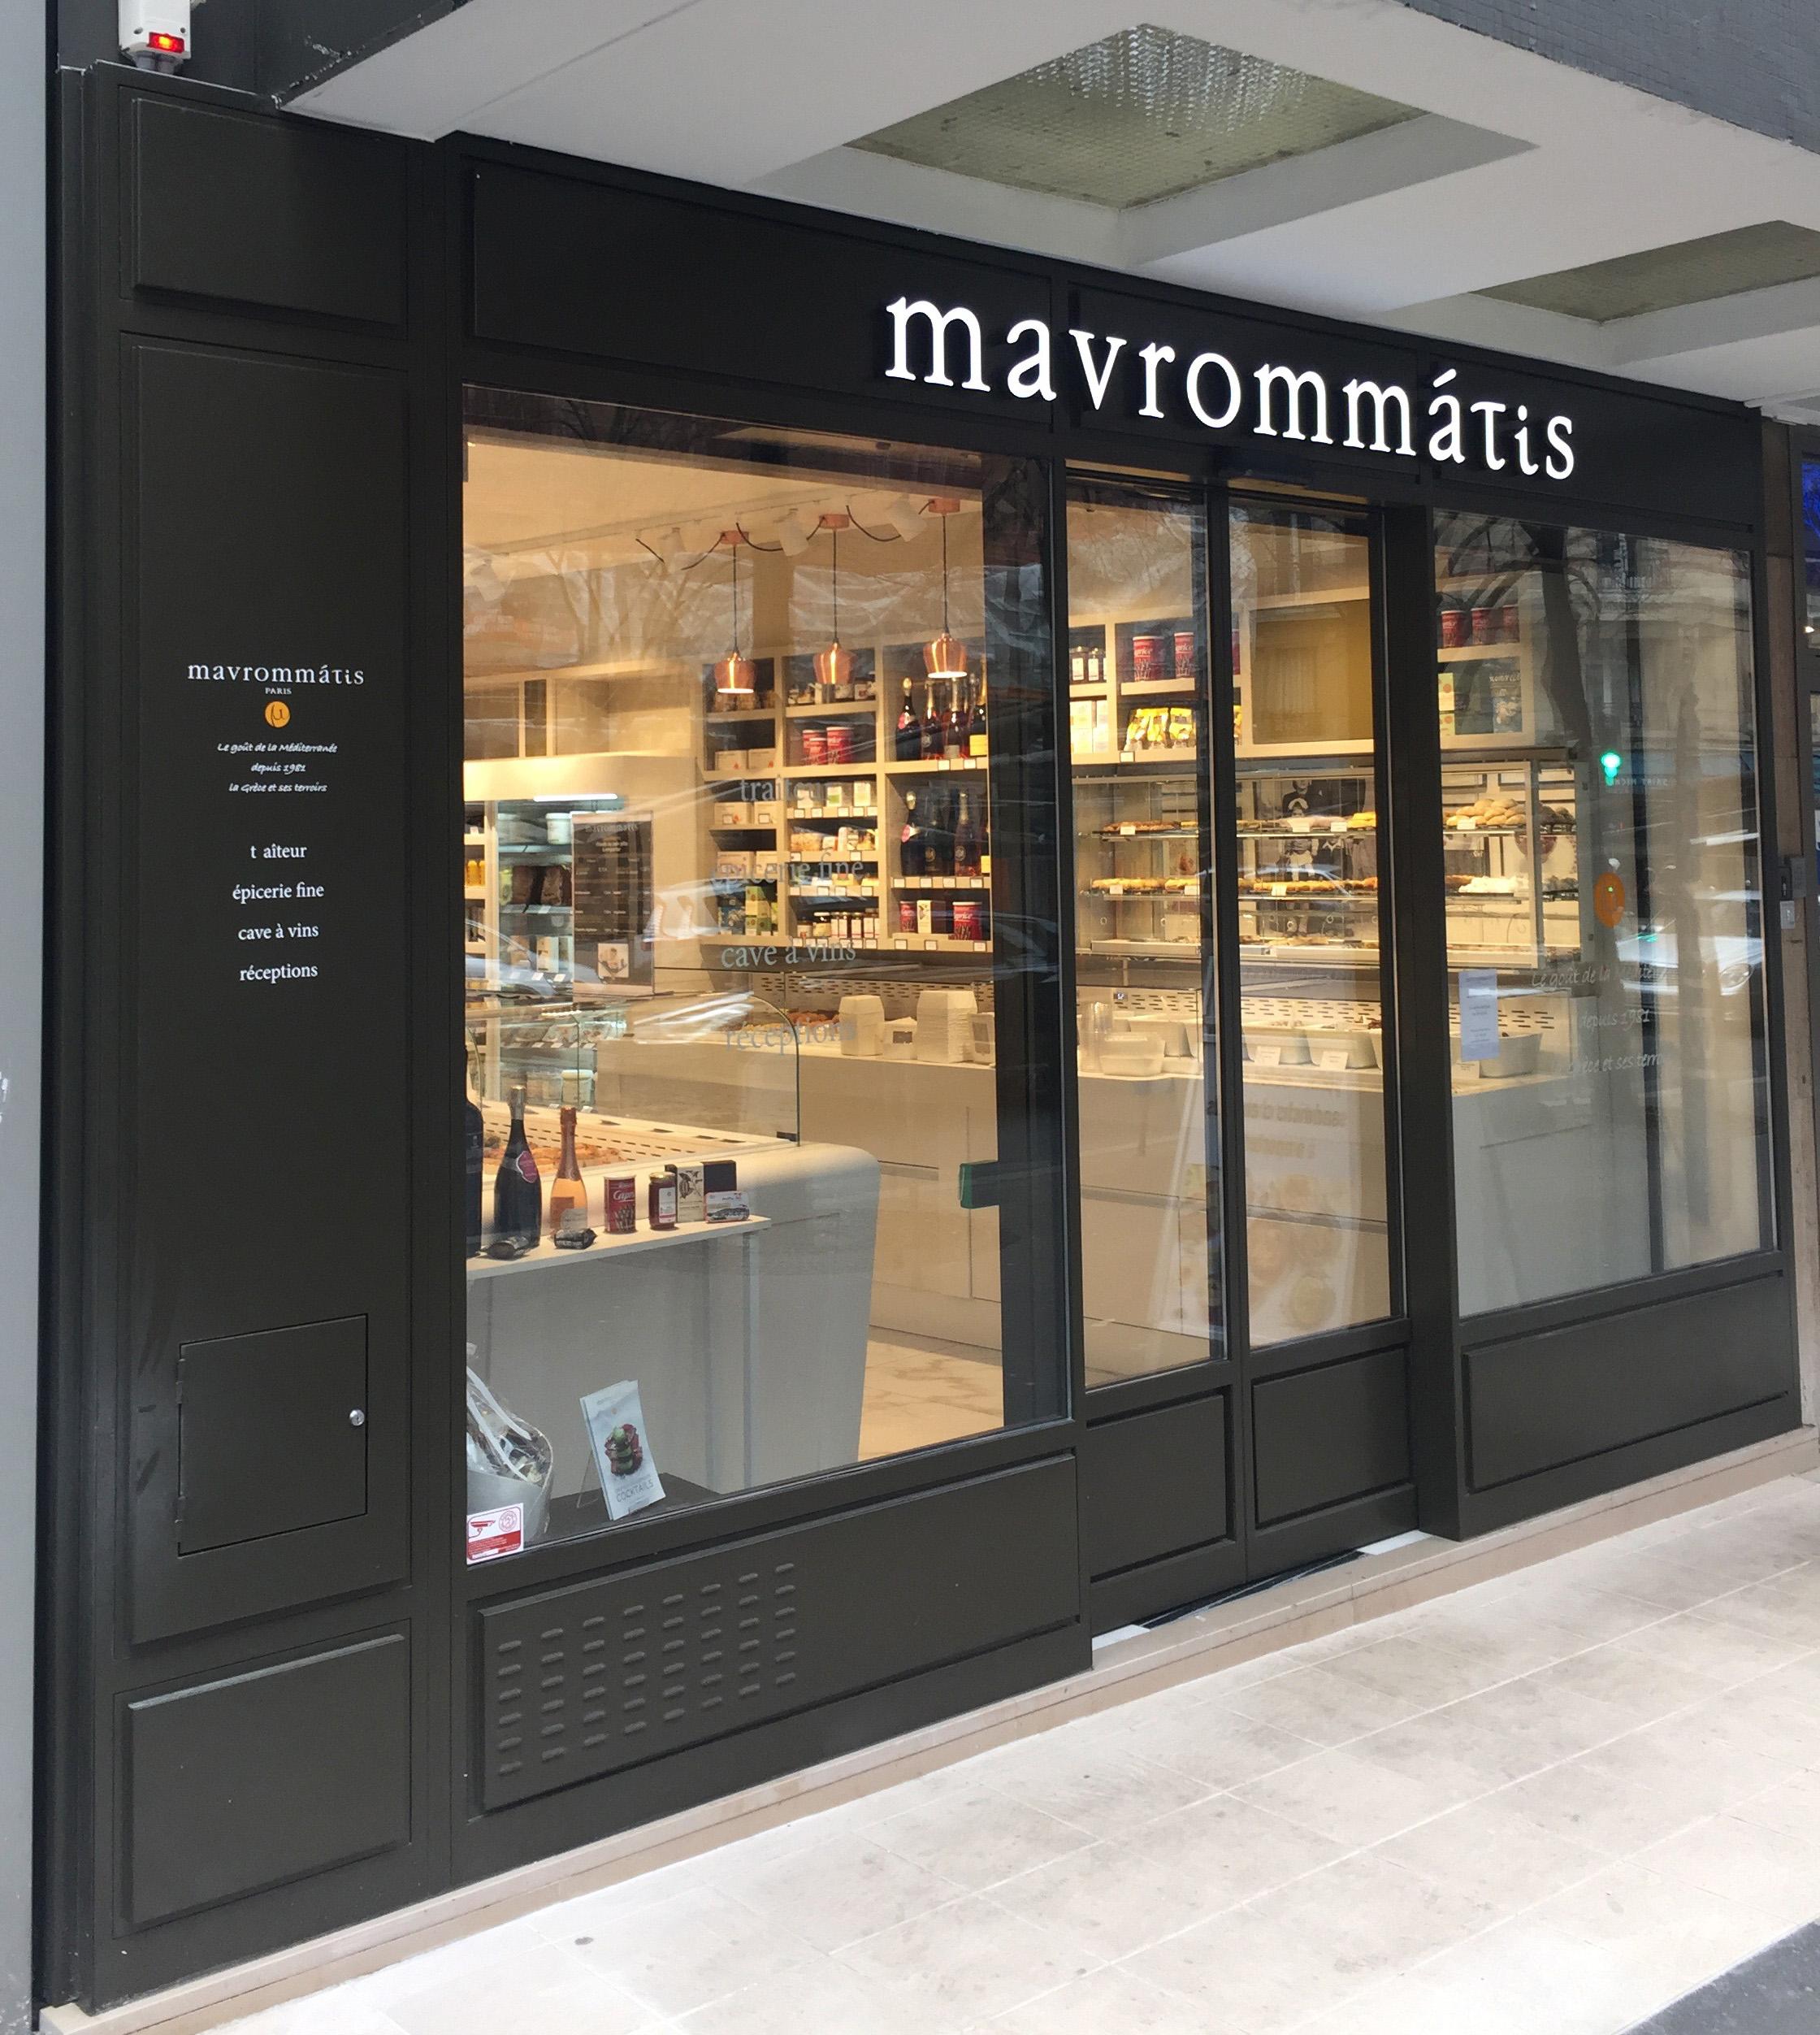 mavrommatis-–-rue-de-la-convention-paris-image-3